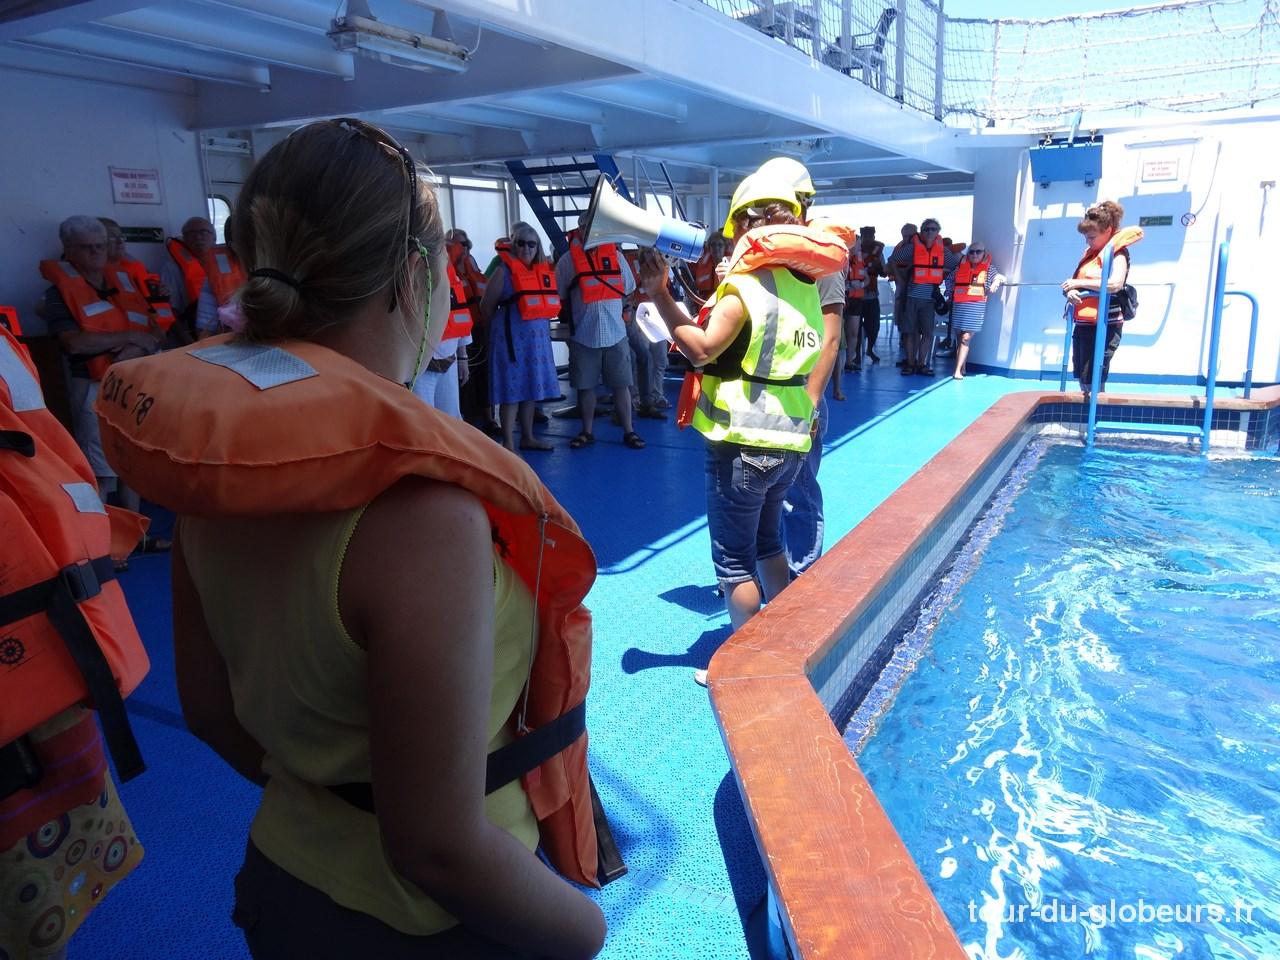 Marquises - Aranui - Exercice évacuation